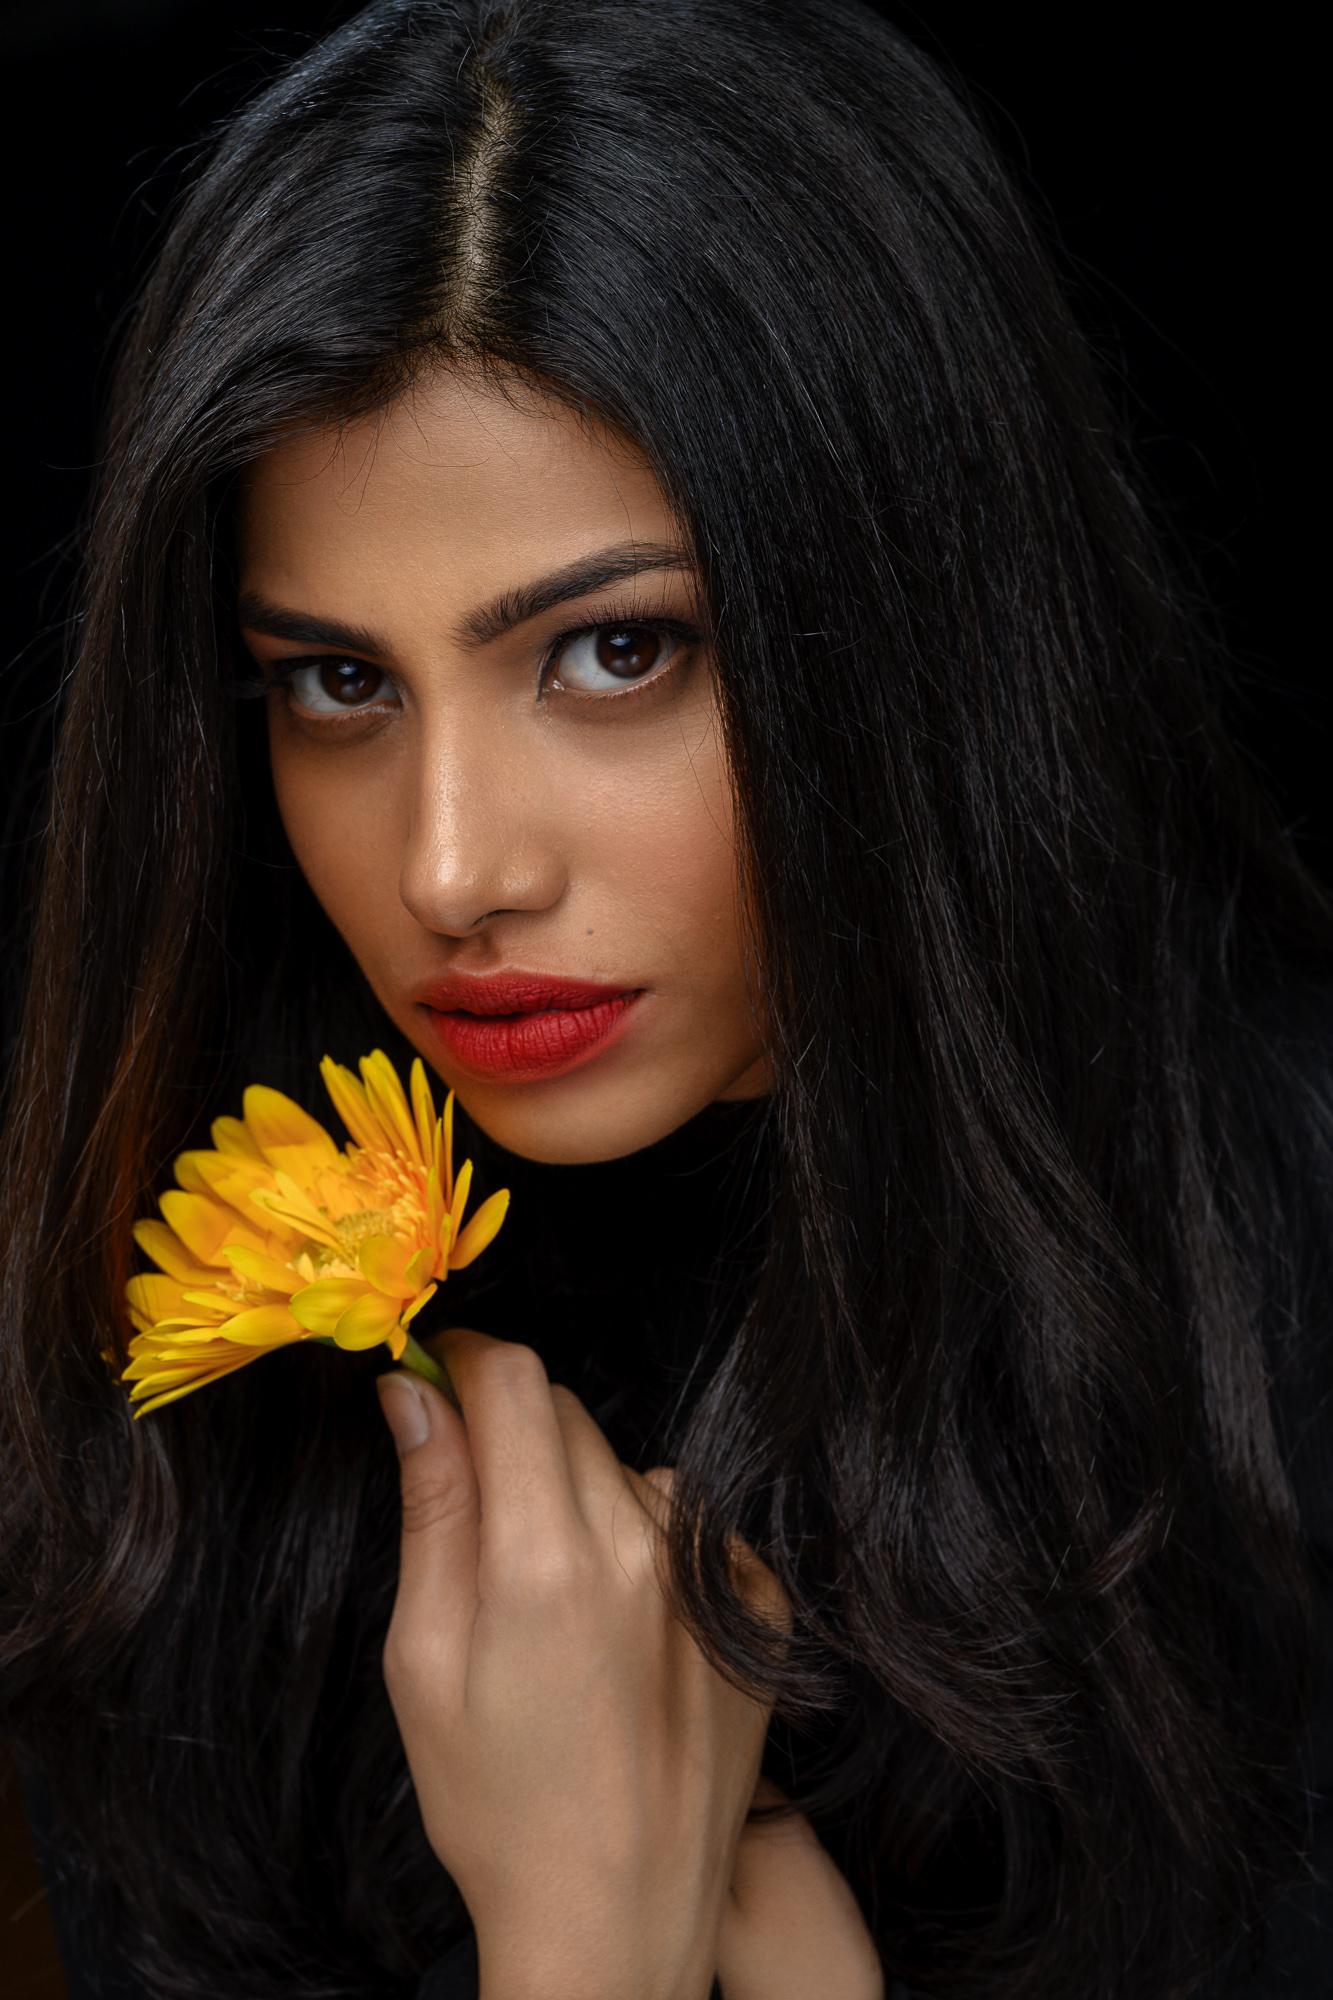 Neeta-Shankar-Photography-Portrait-Shoot-Model-Portfolio-Contemporary-Portraits-Beauty-Shots